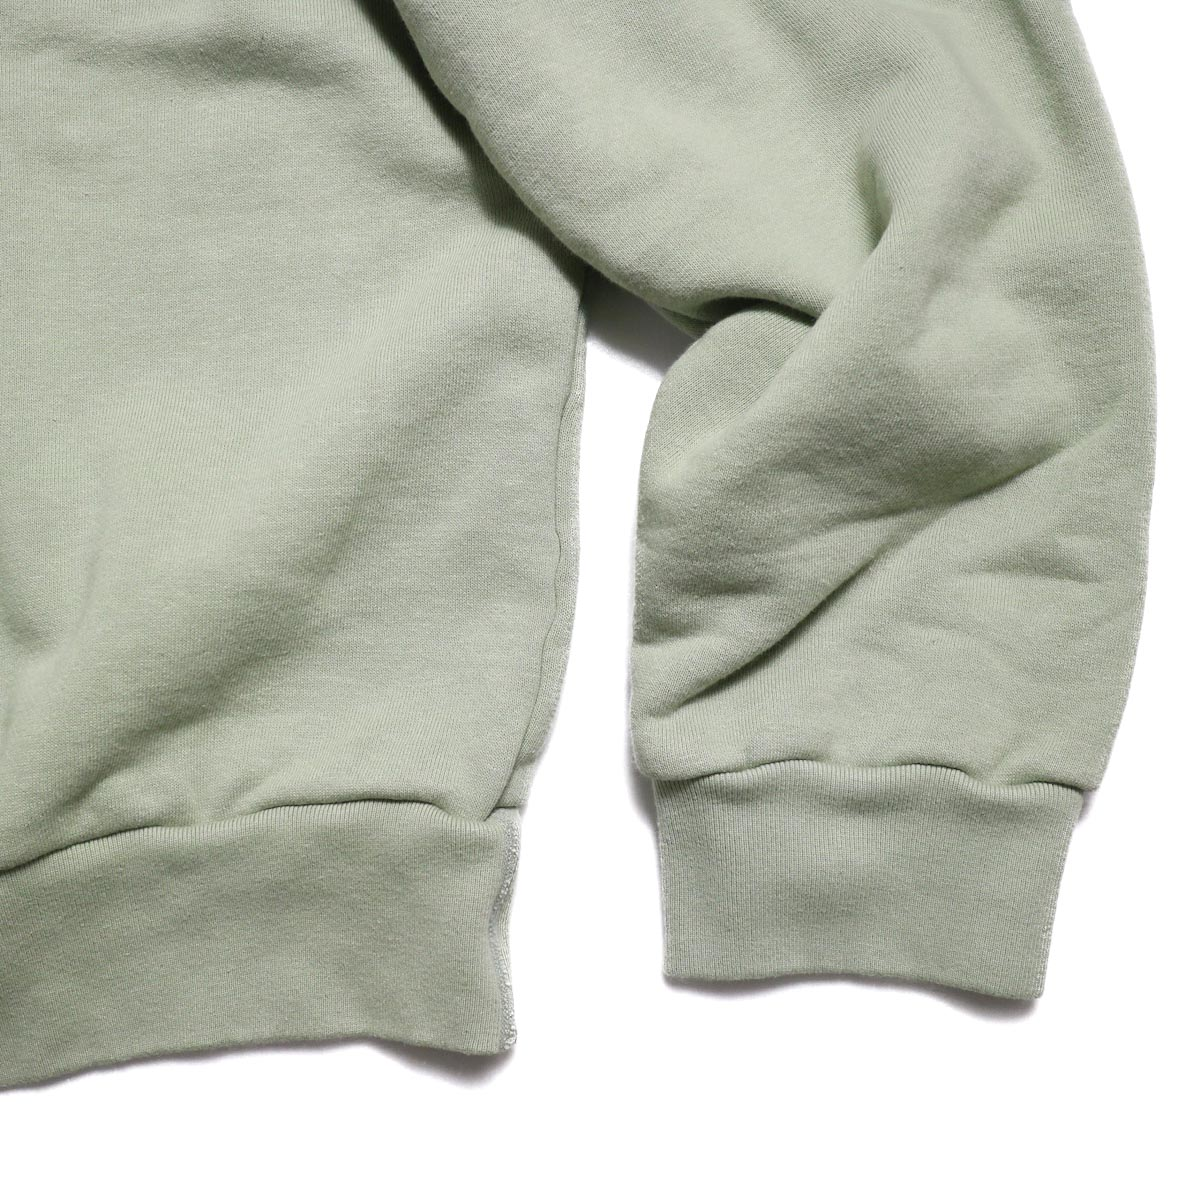 UNUSED / US1530 Crew Neck Sweat Shirt -SAGE GREEN 袖、裾